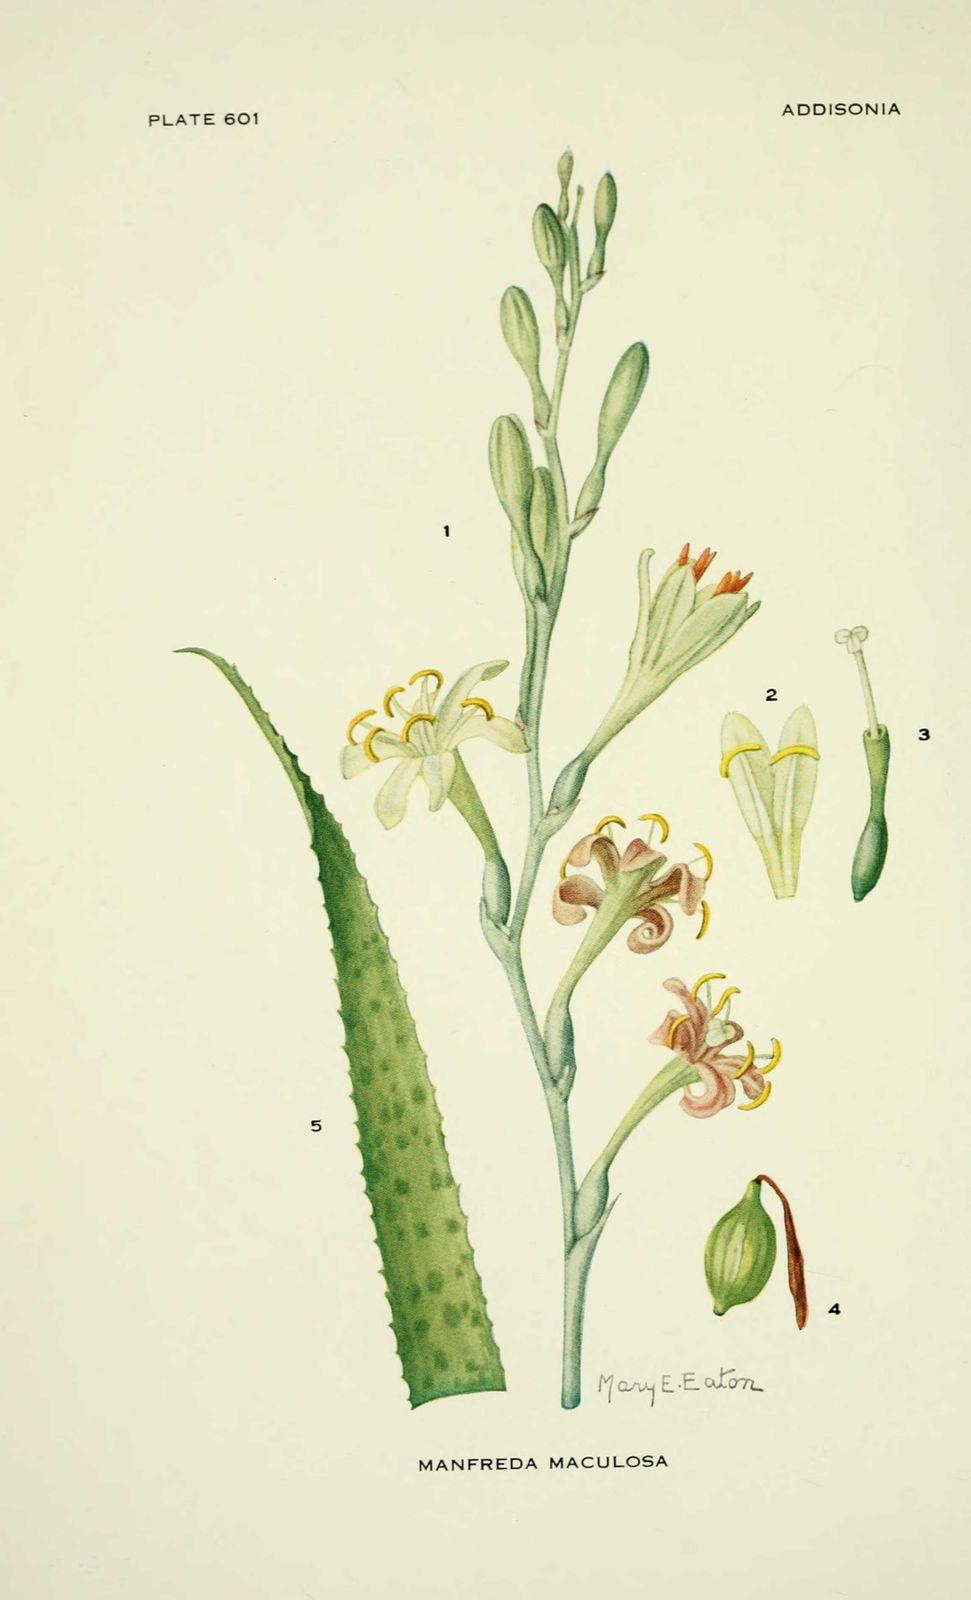 dessin fleur manfreda maculosa - lis epice